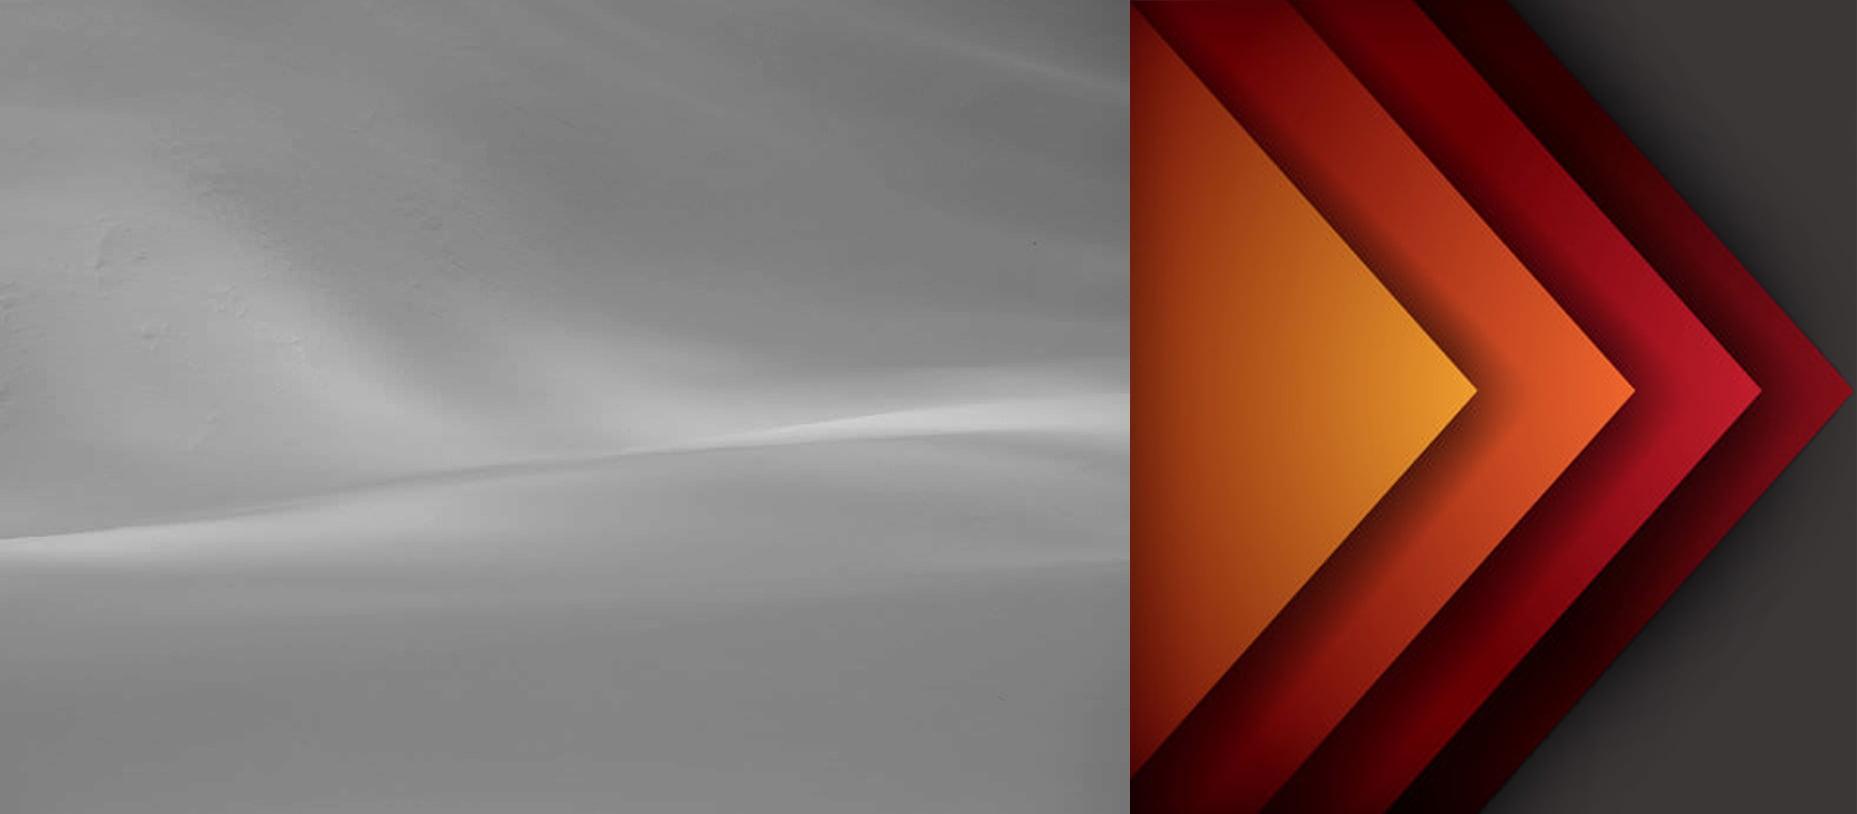 Abstract  Photography11jpg - 35 ایده و راهنما برای عکاسی انتراعی